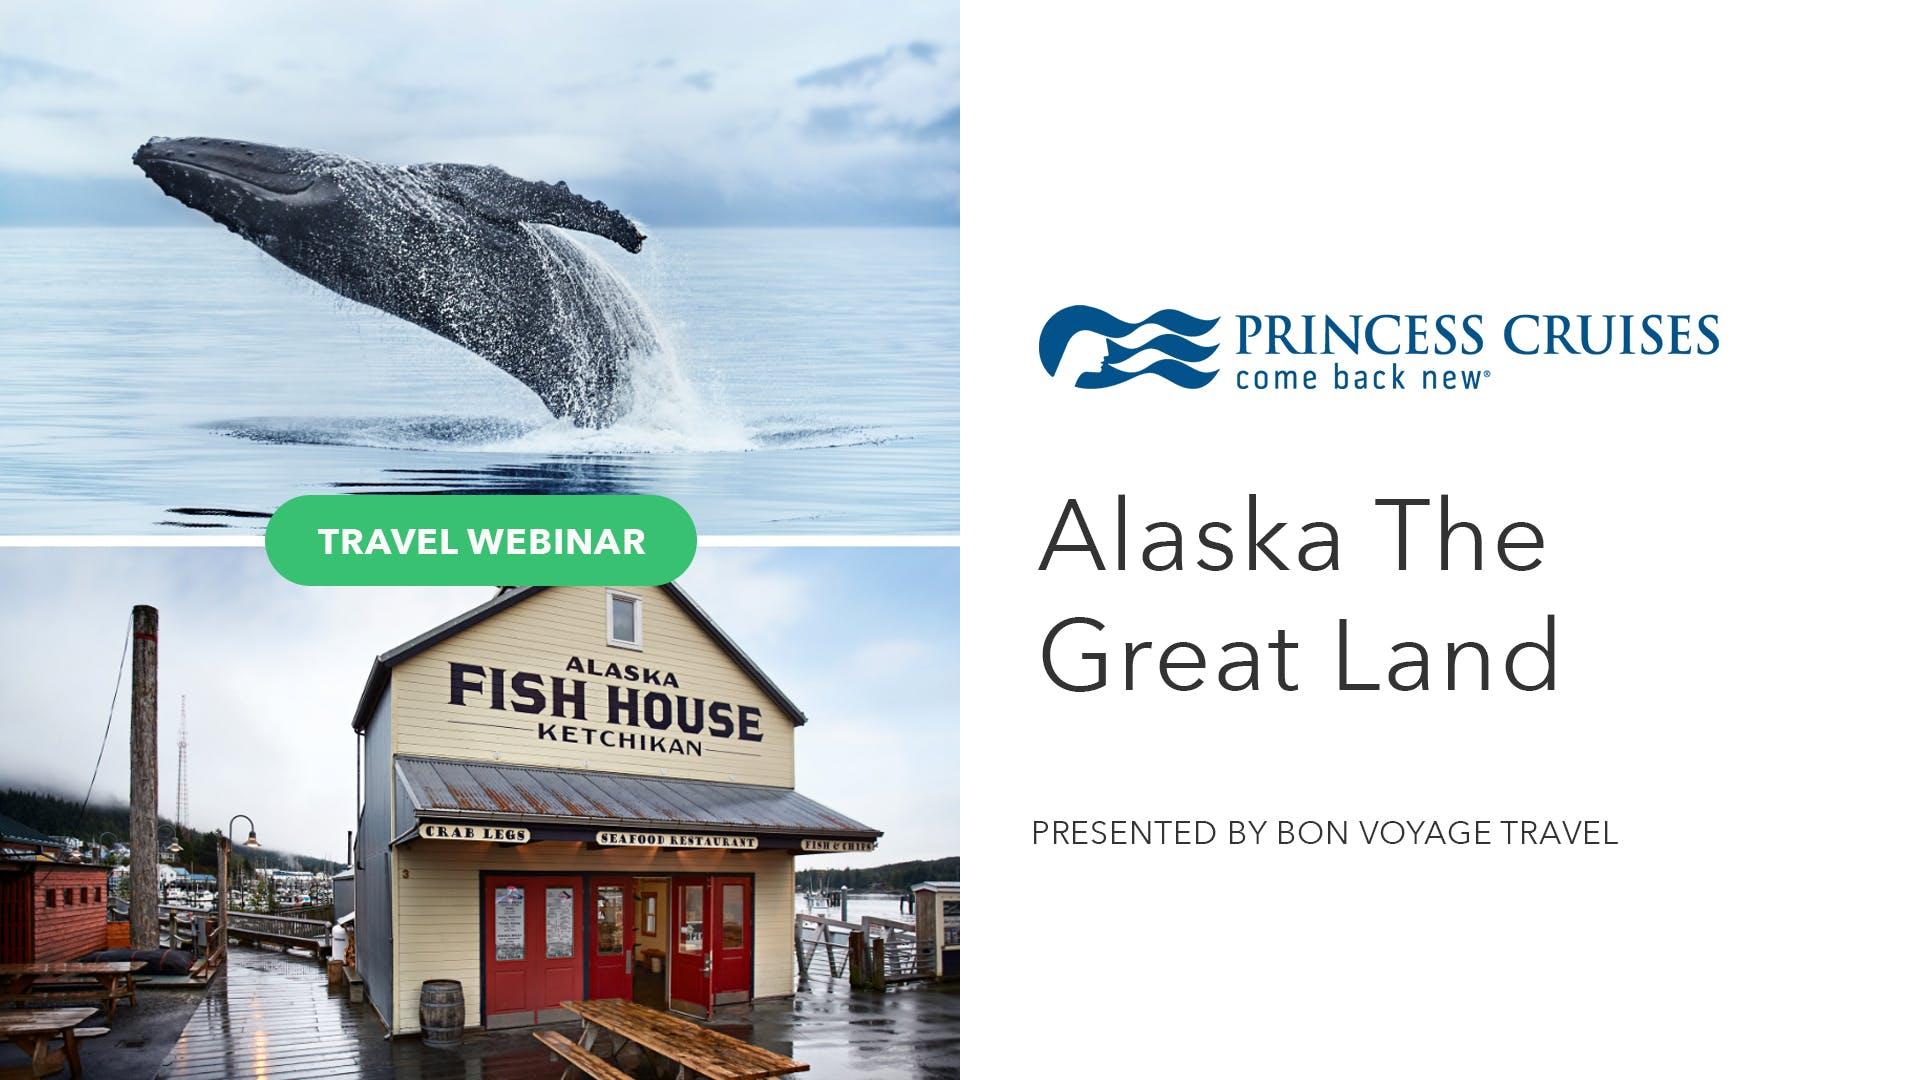 Alaska The Great Land with Princess Cruises